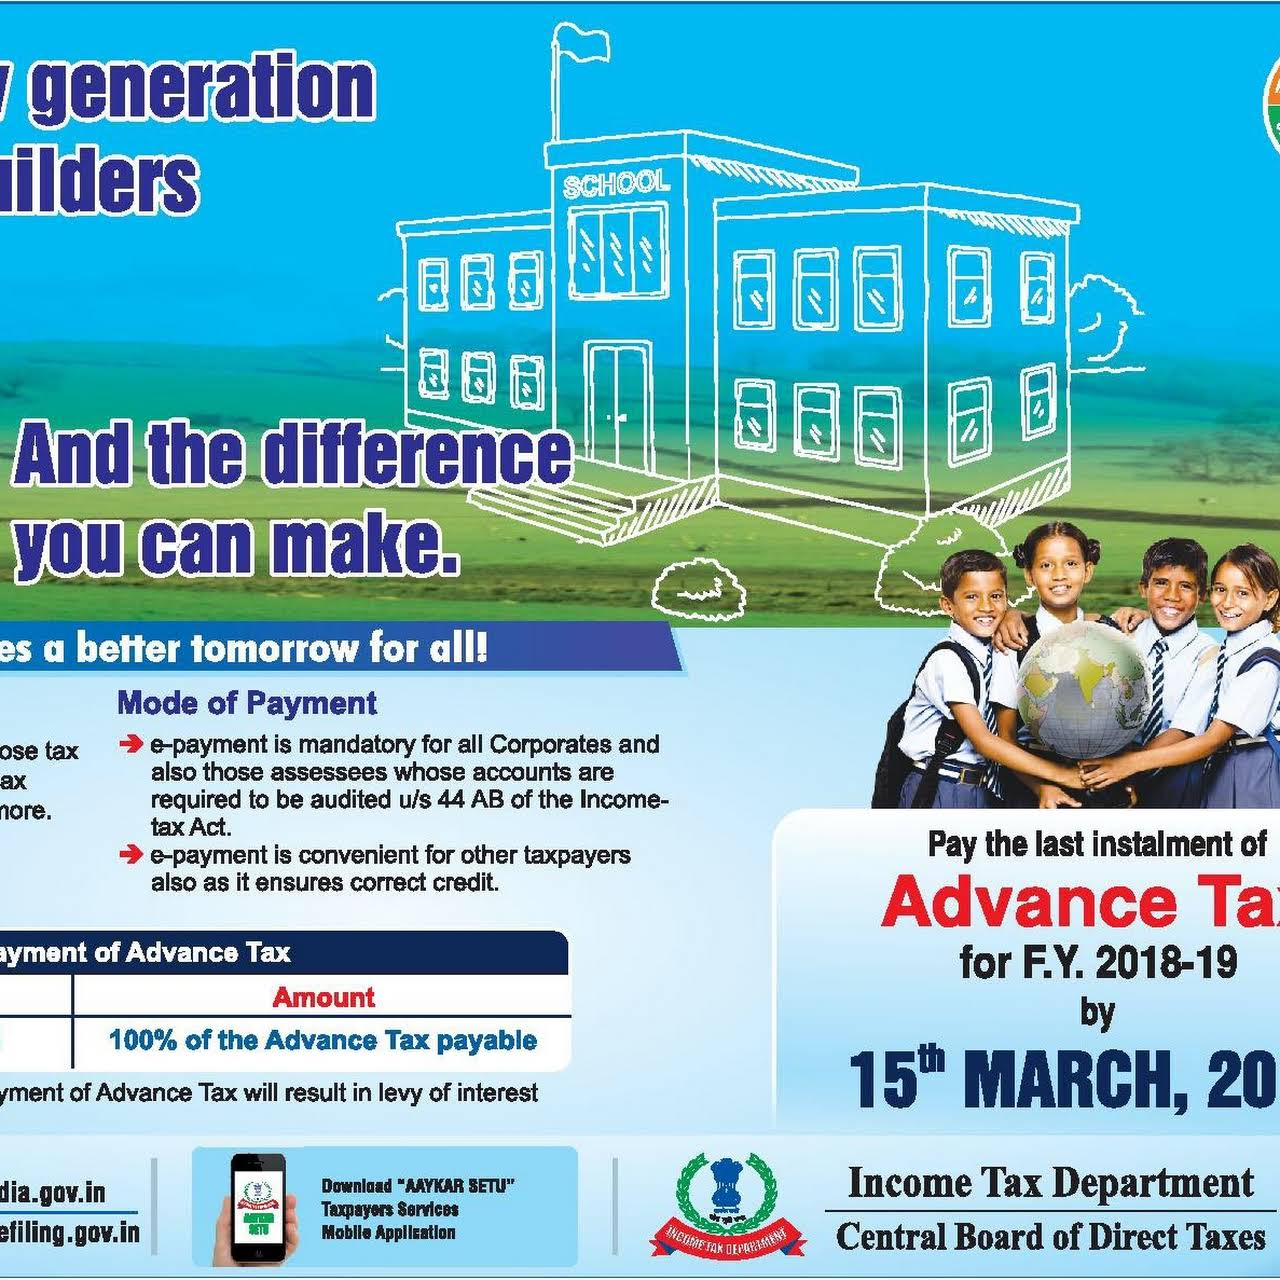 Manikandan and Associates - Tax Consultant ,Accounting